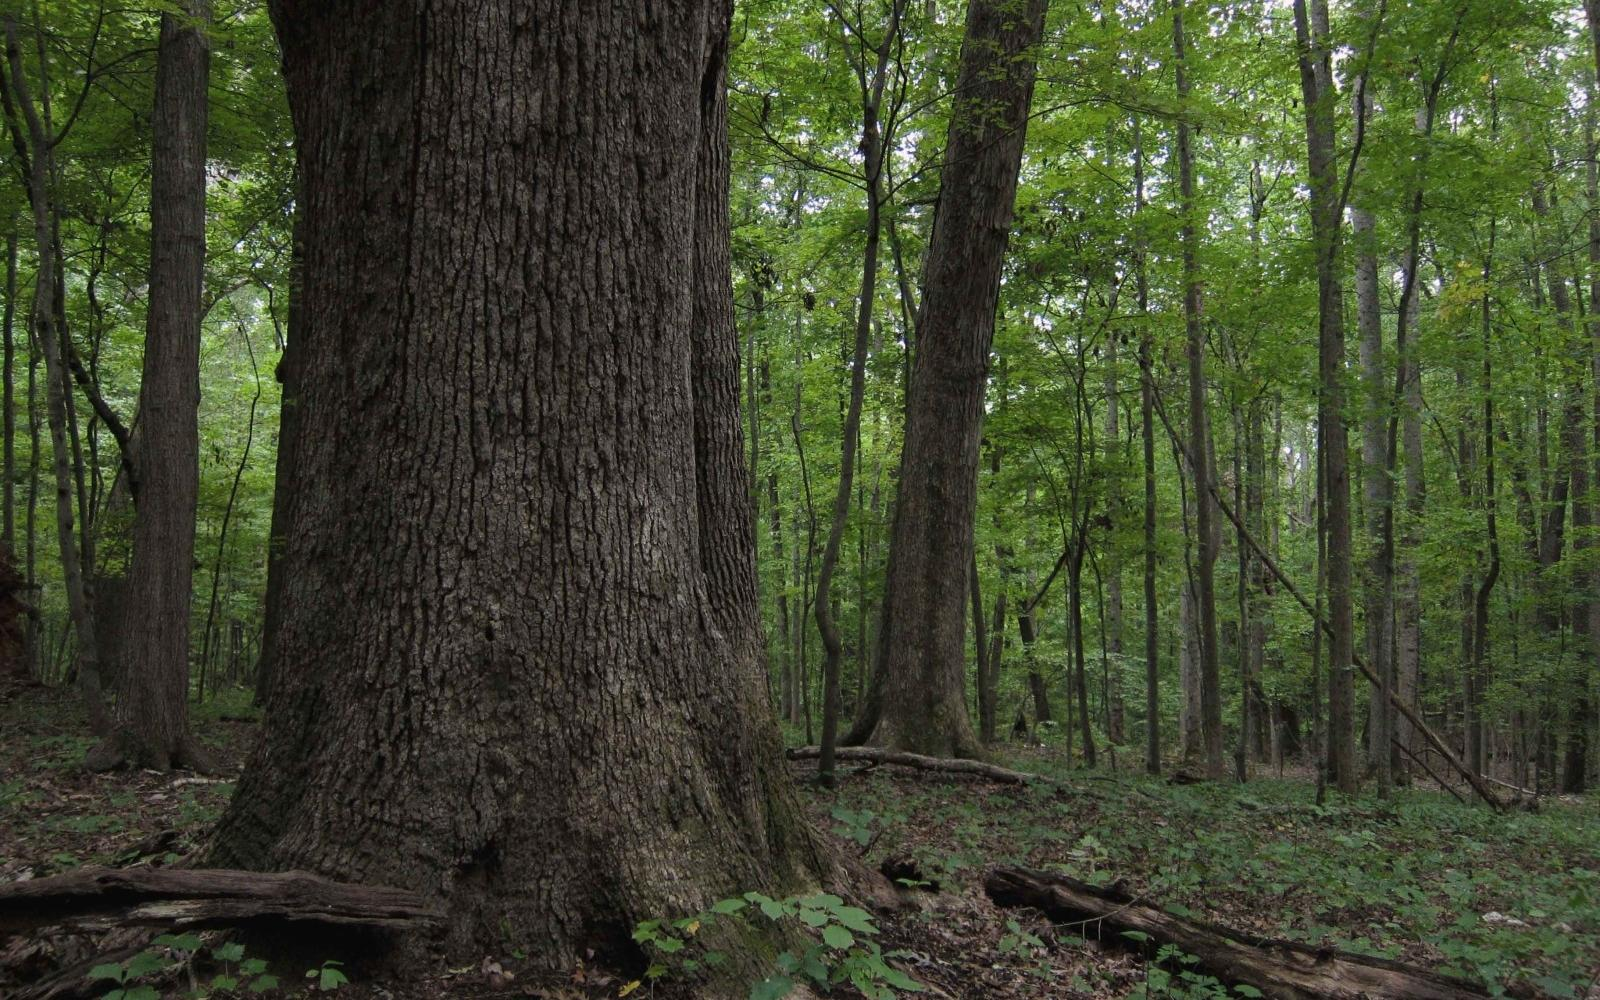 White oak (Quercus alba) - Photo: Flickr/ Miguel Vieira